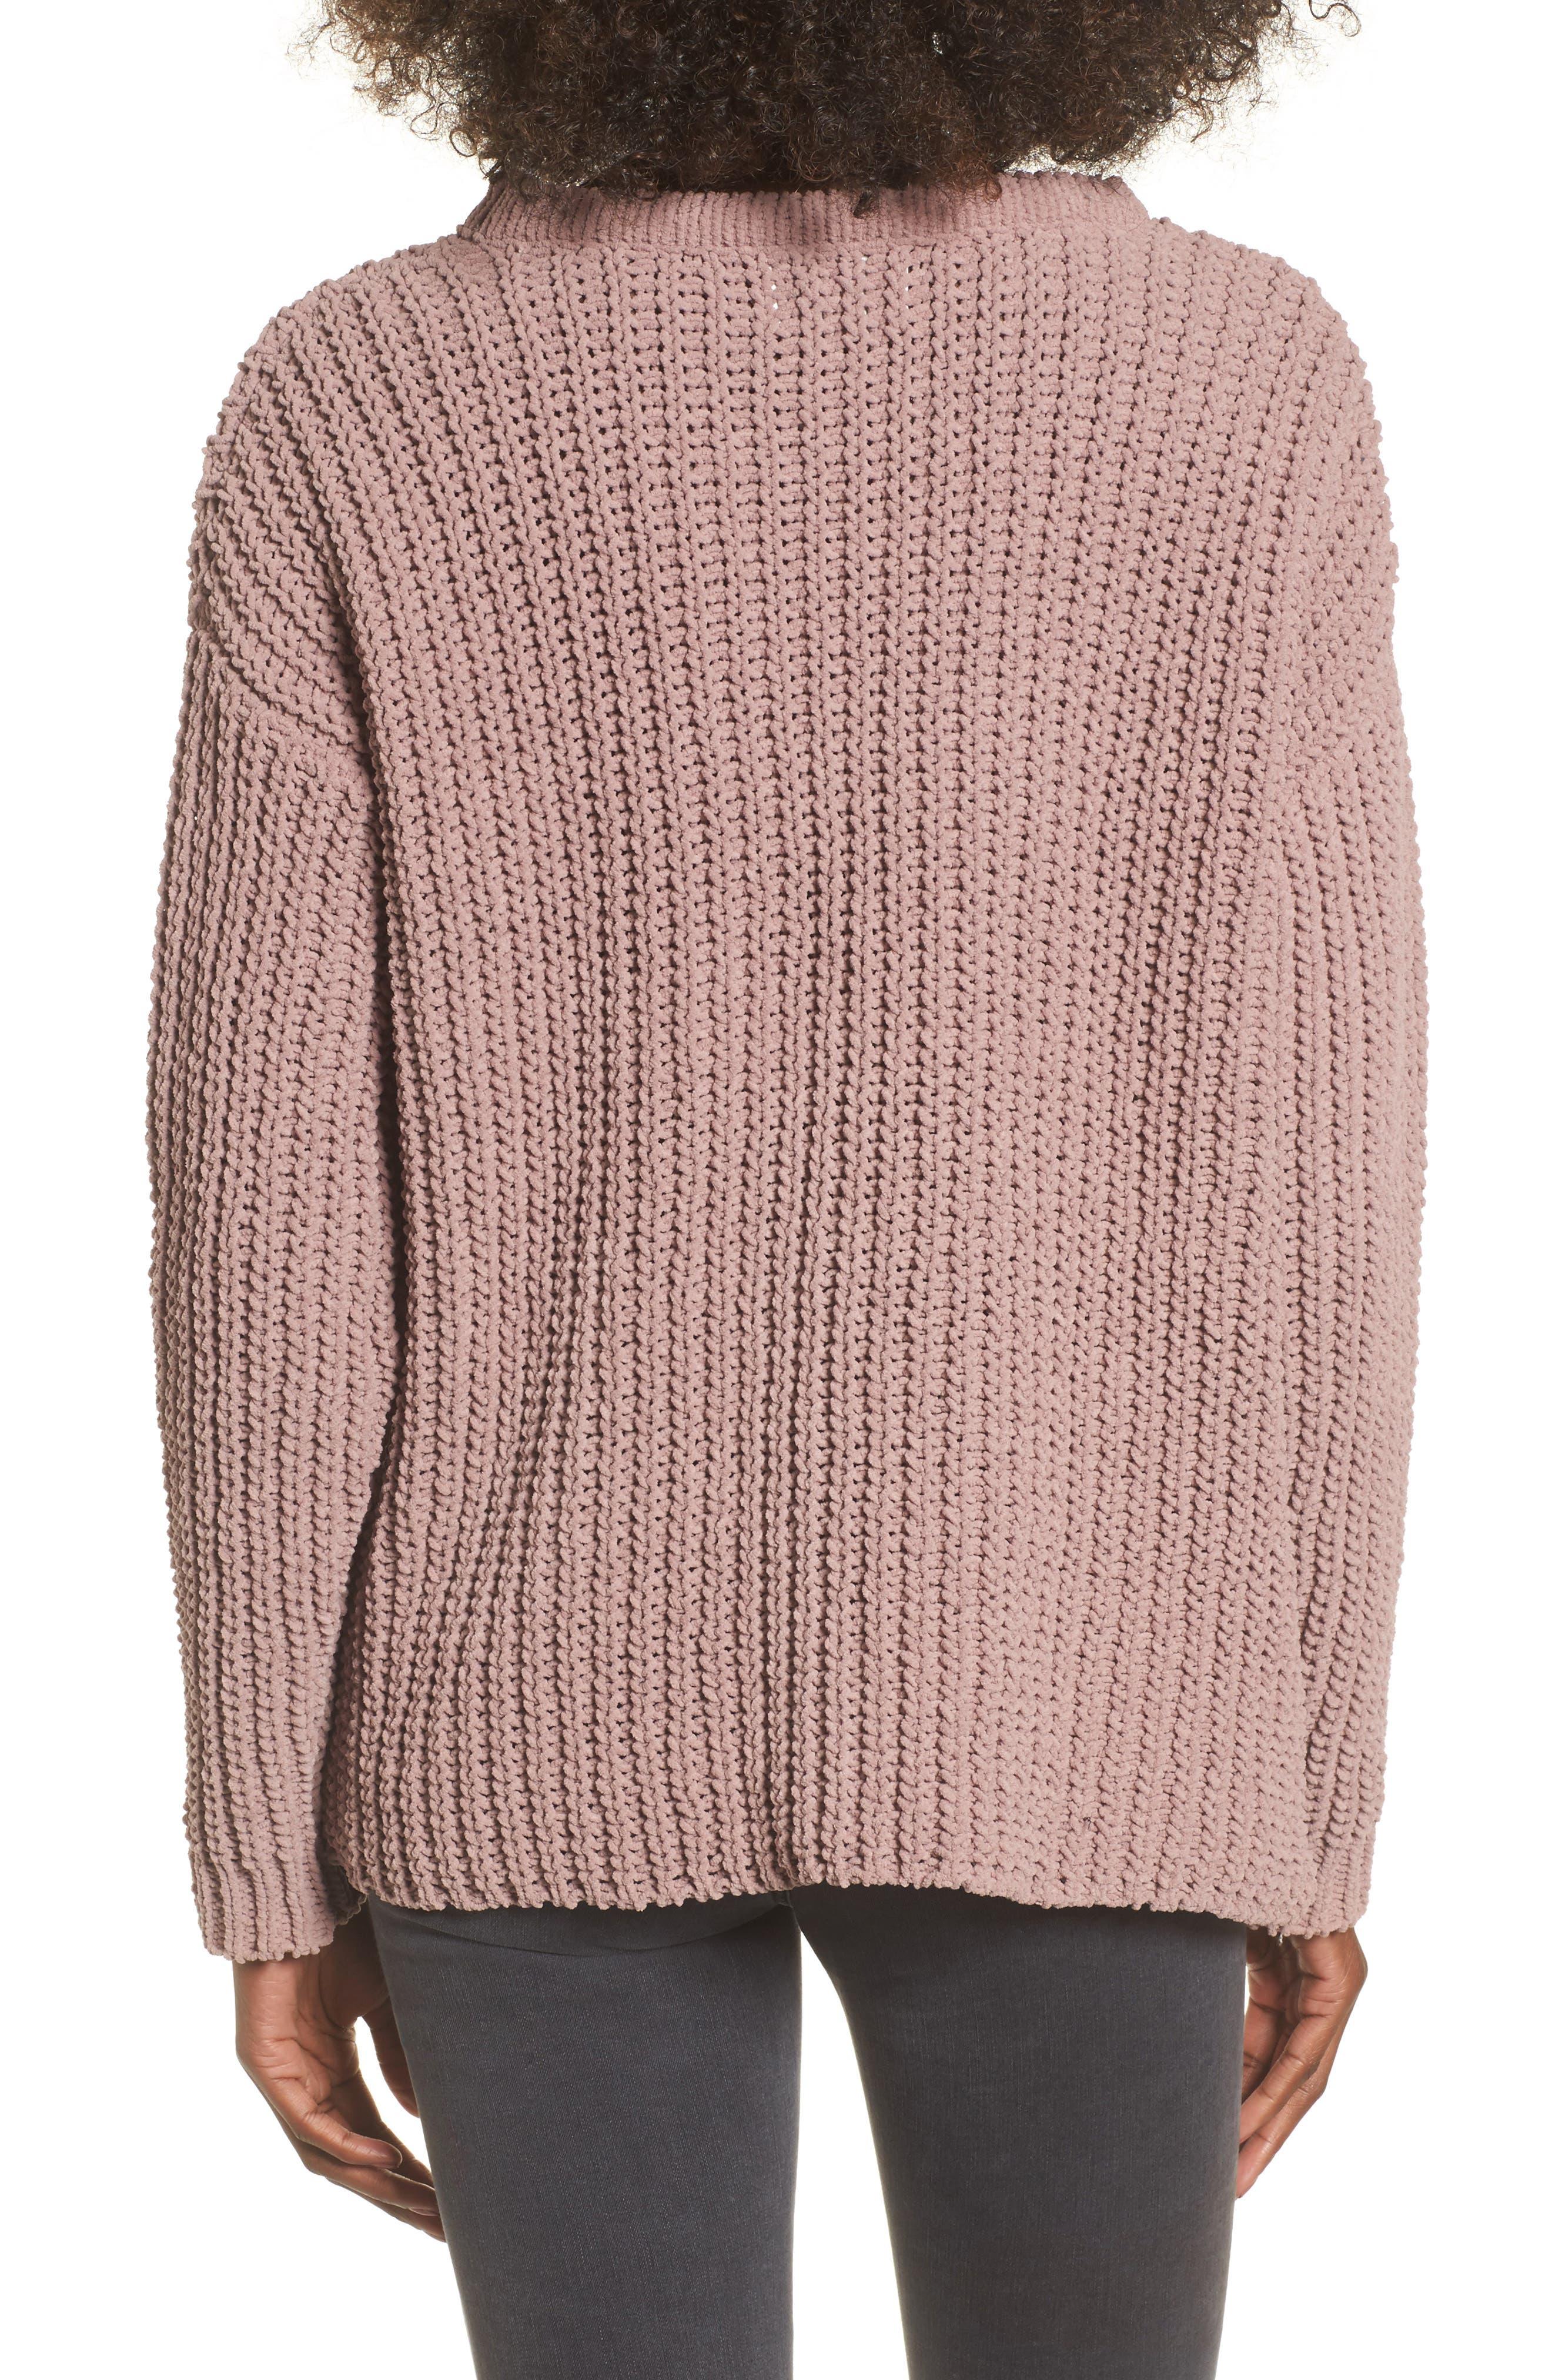 Mary Lous Choker Sweater,                             Alternate thumbnail 4, color,